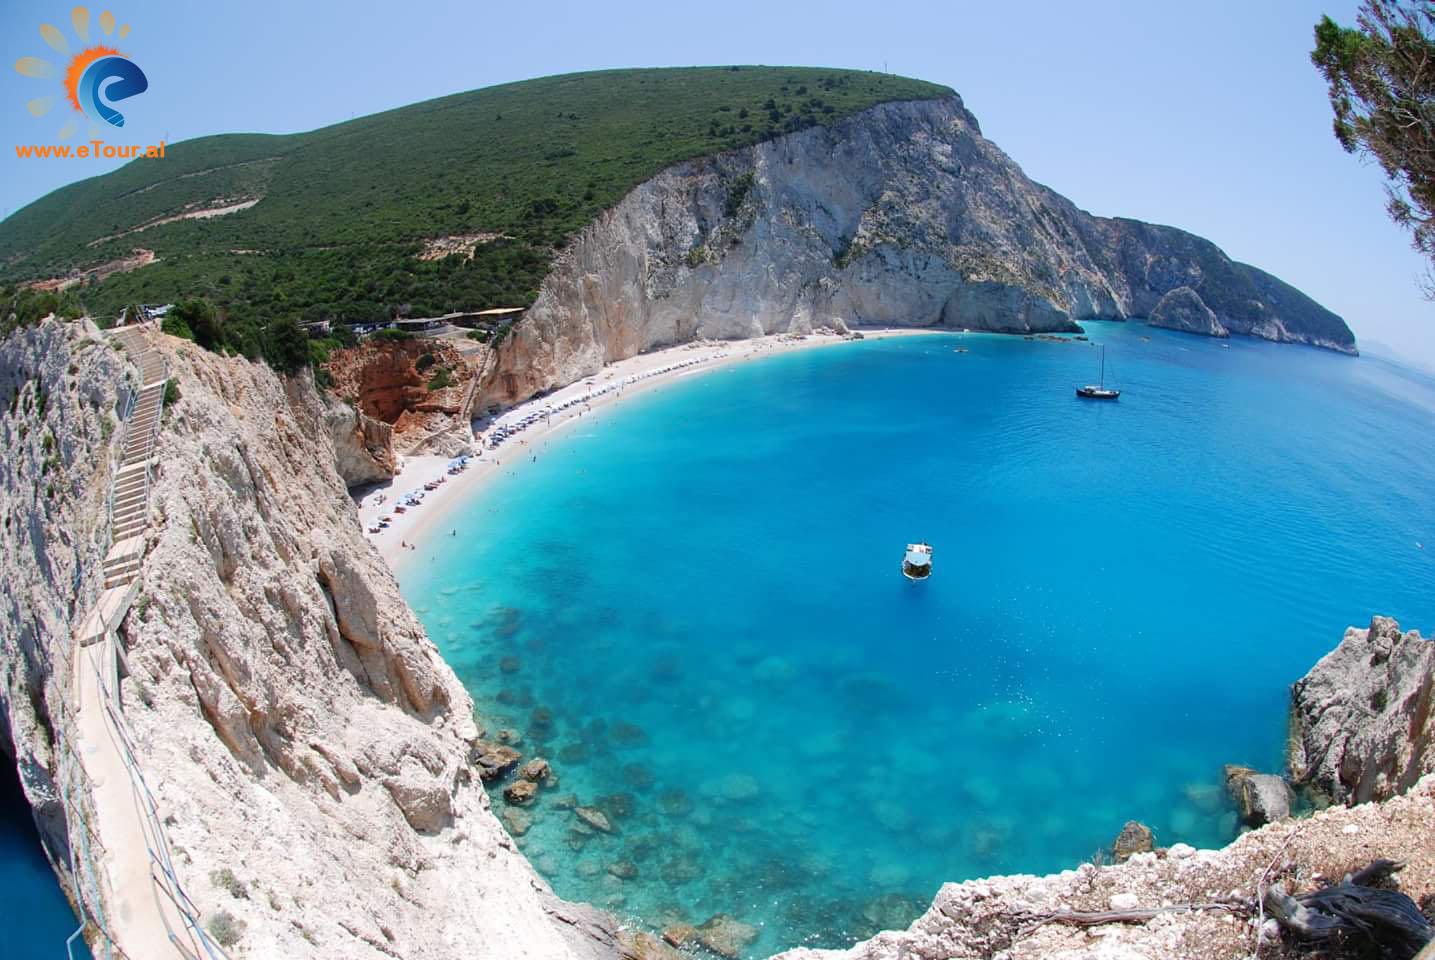 Tur 3 ditor Lefkada-Parga-Janina - Greqi